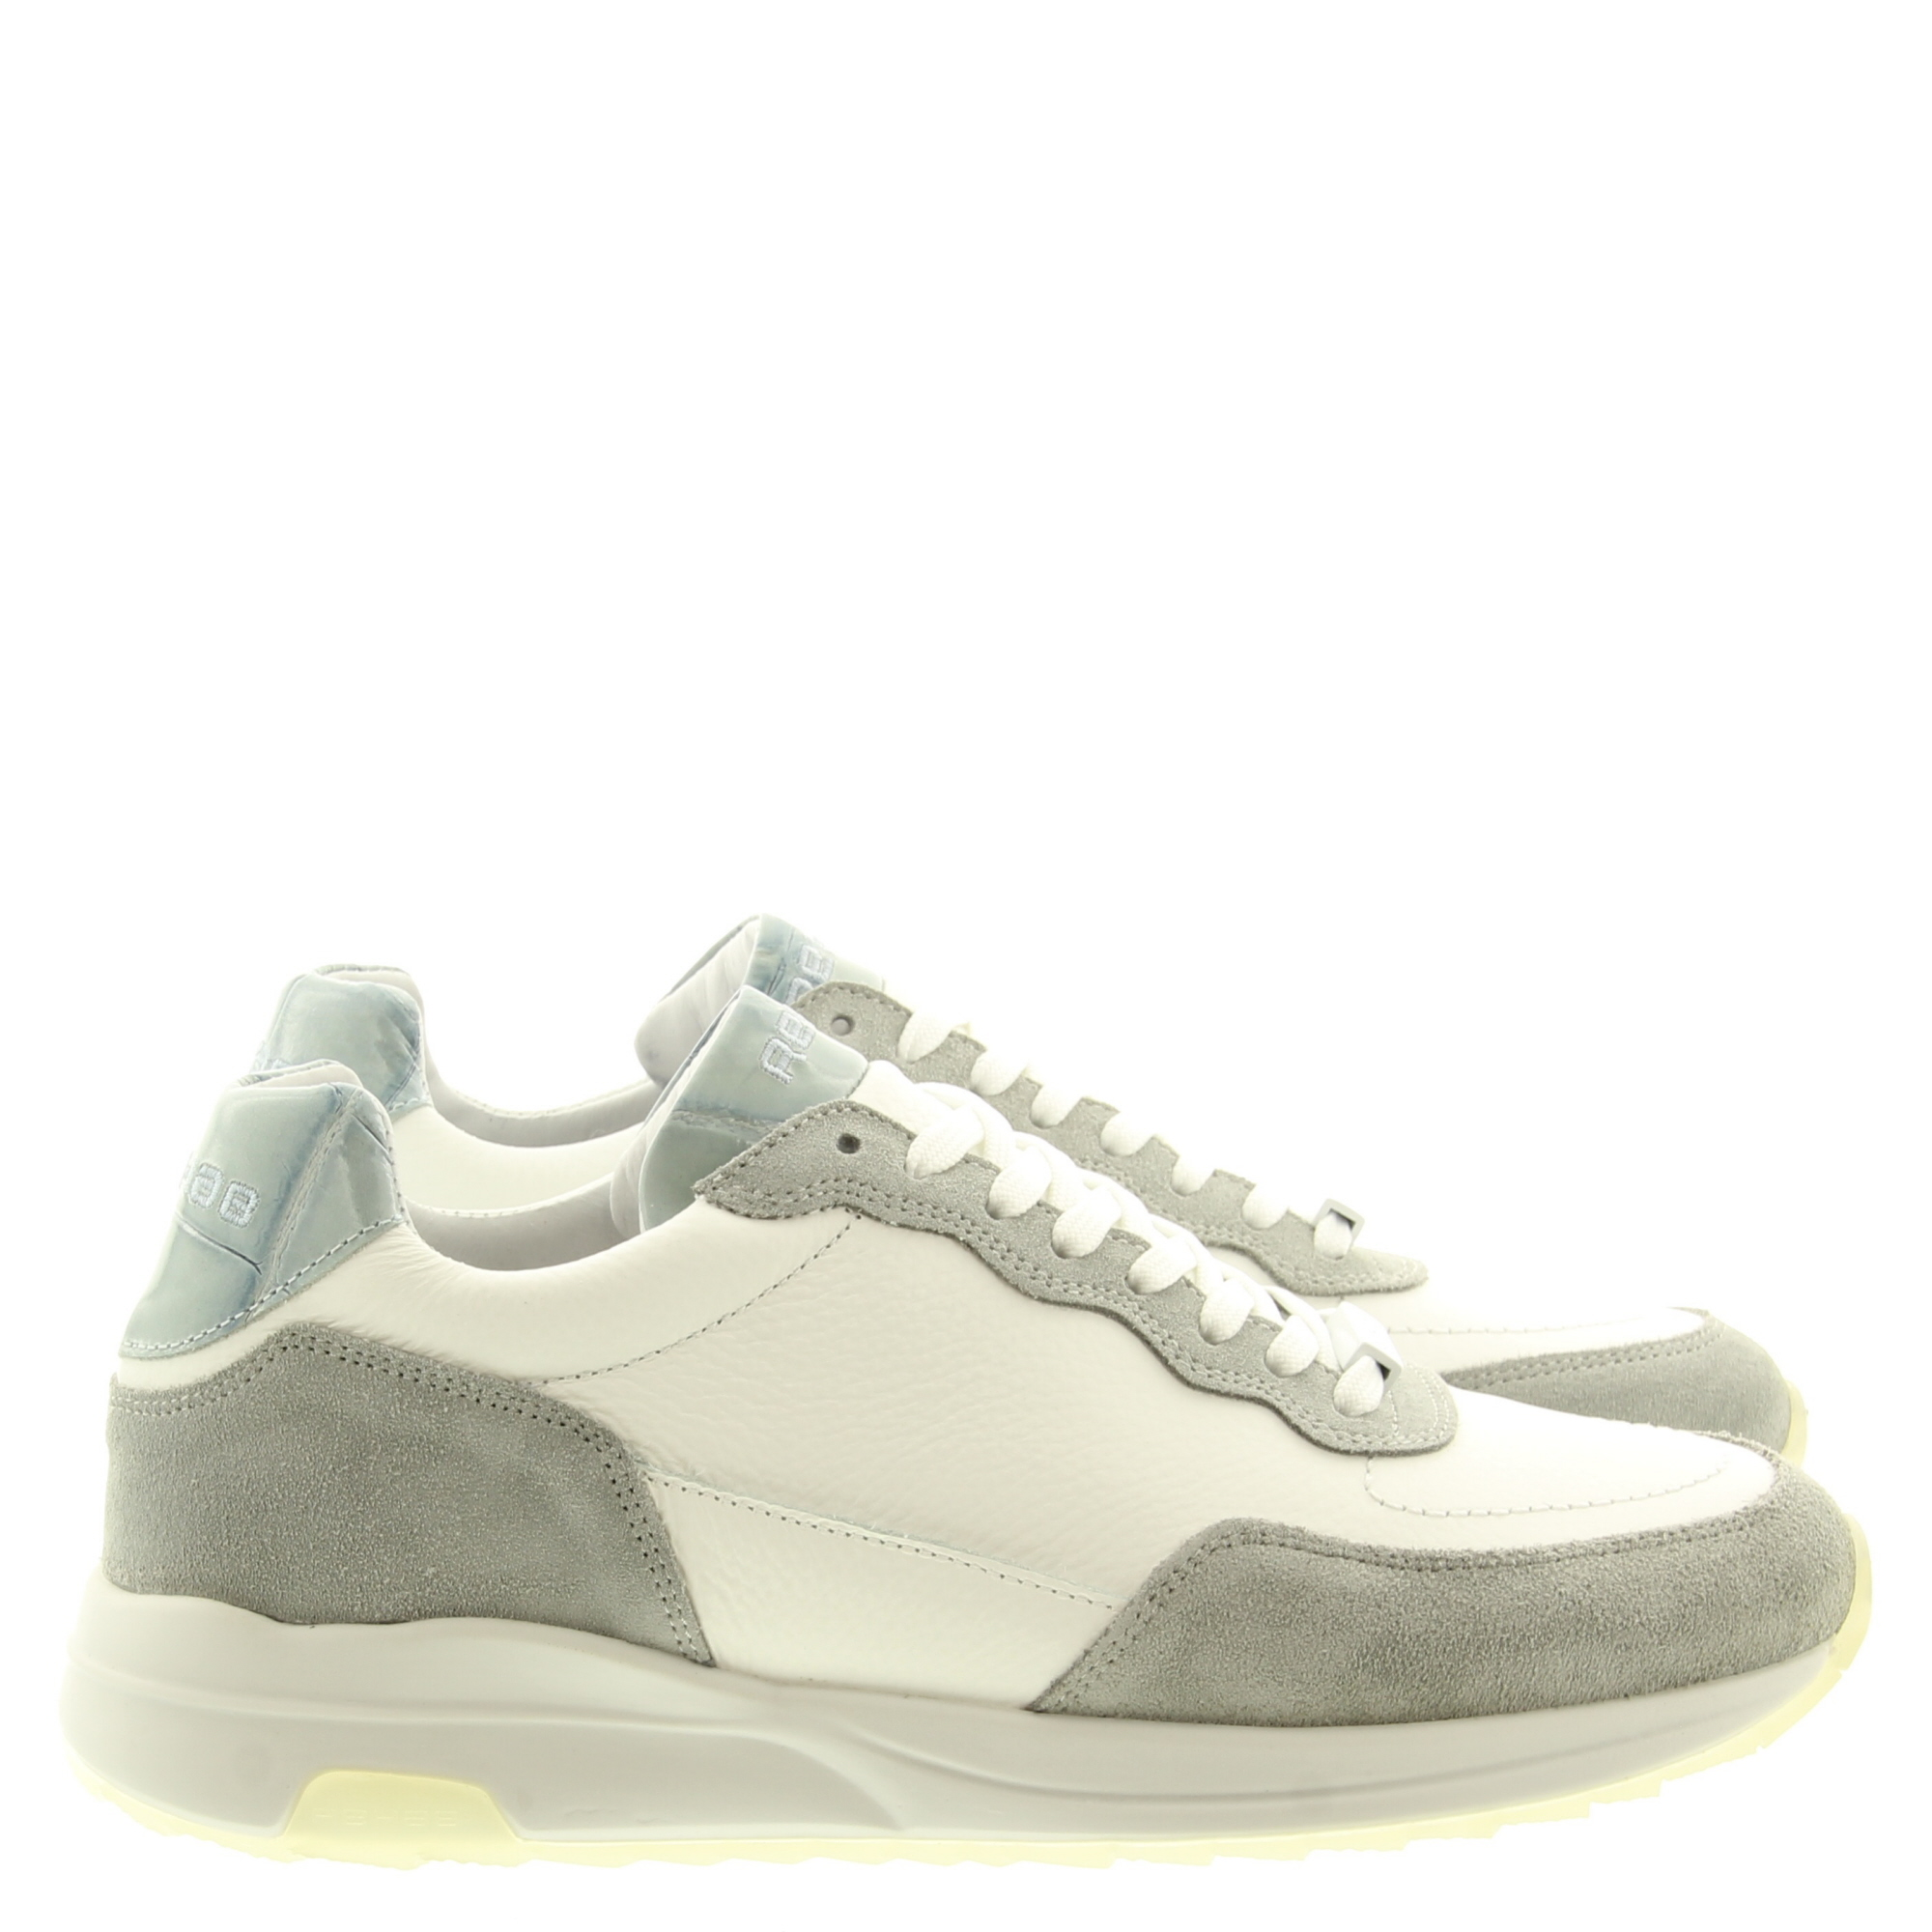 Rehab Horos 0720 White Grey